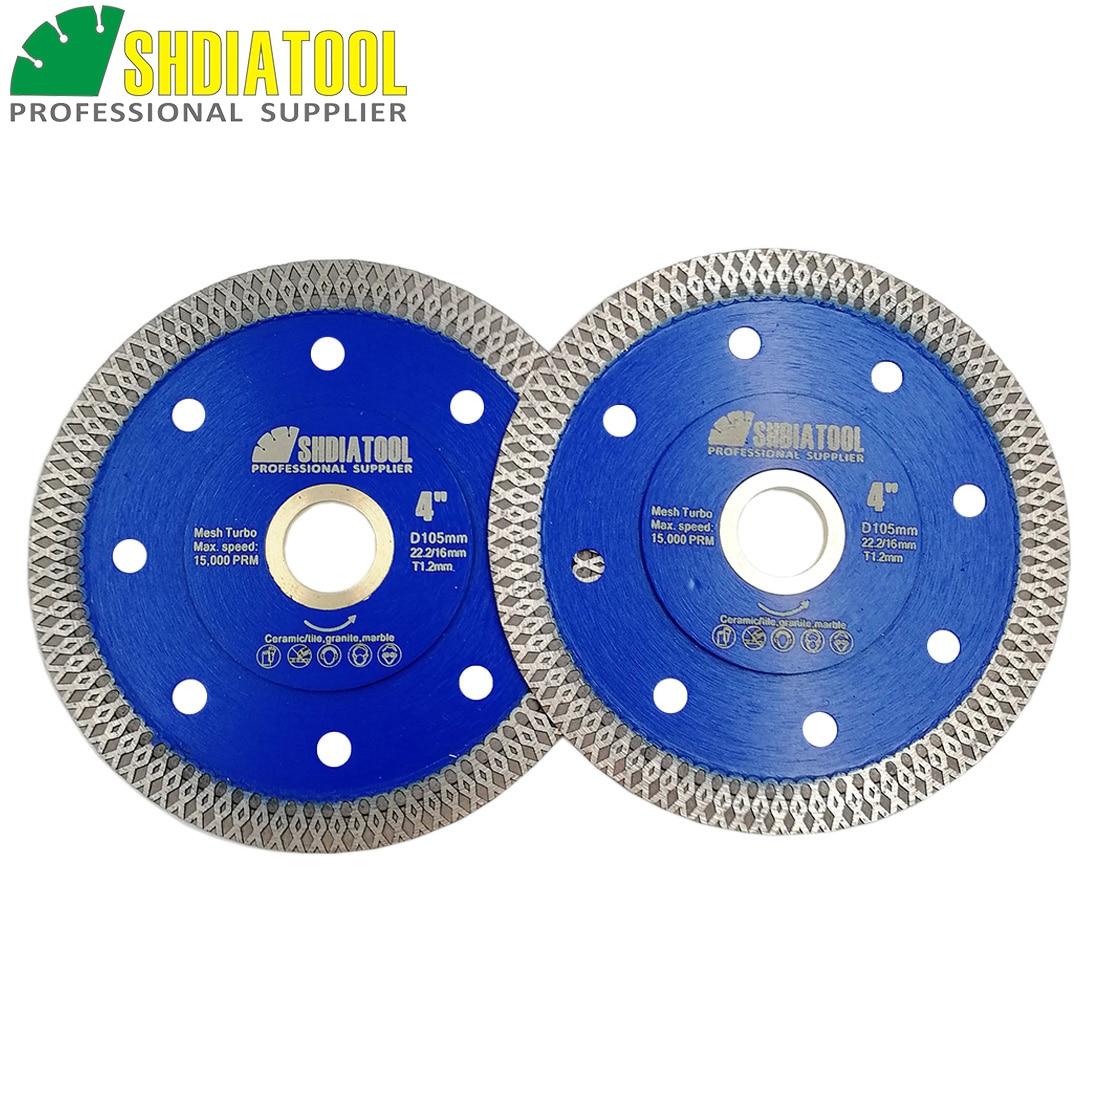 SHDIATOOL 2pcs Diamond Cutting Disc X Mesh Turbo Rim Segment Saw Blade Dia 4in/105mm Diamond Wheel Cutting Ceramic Marbel Blade